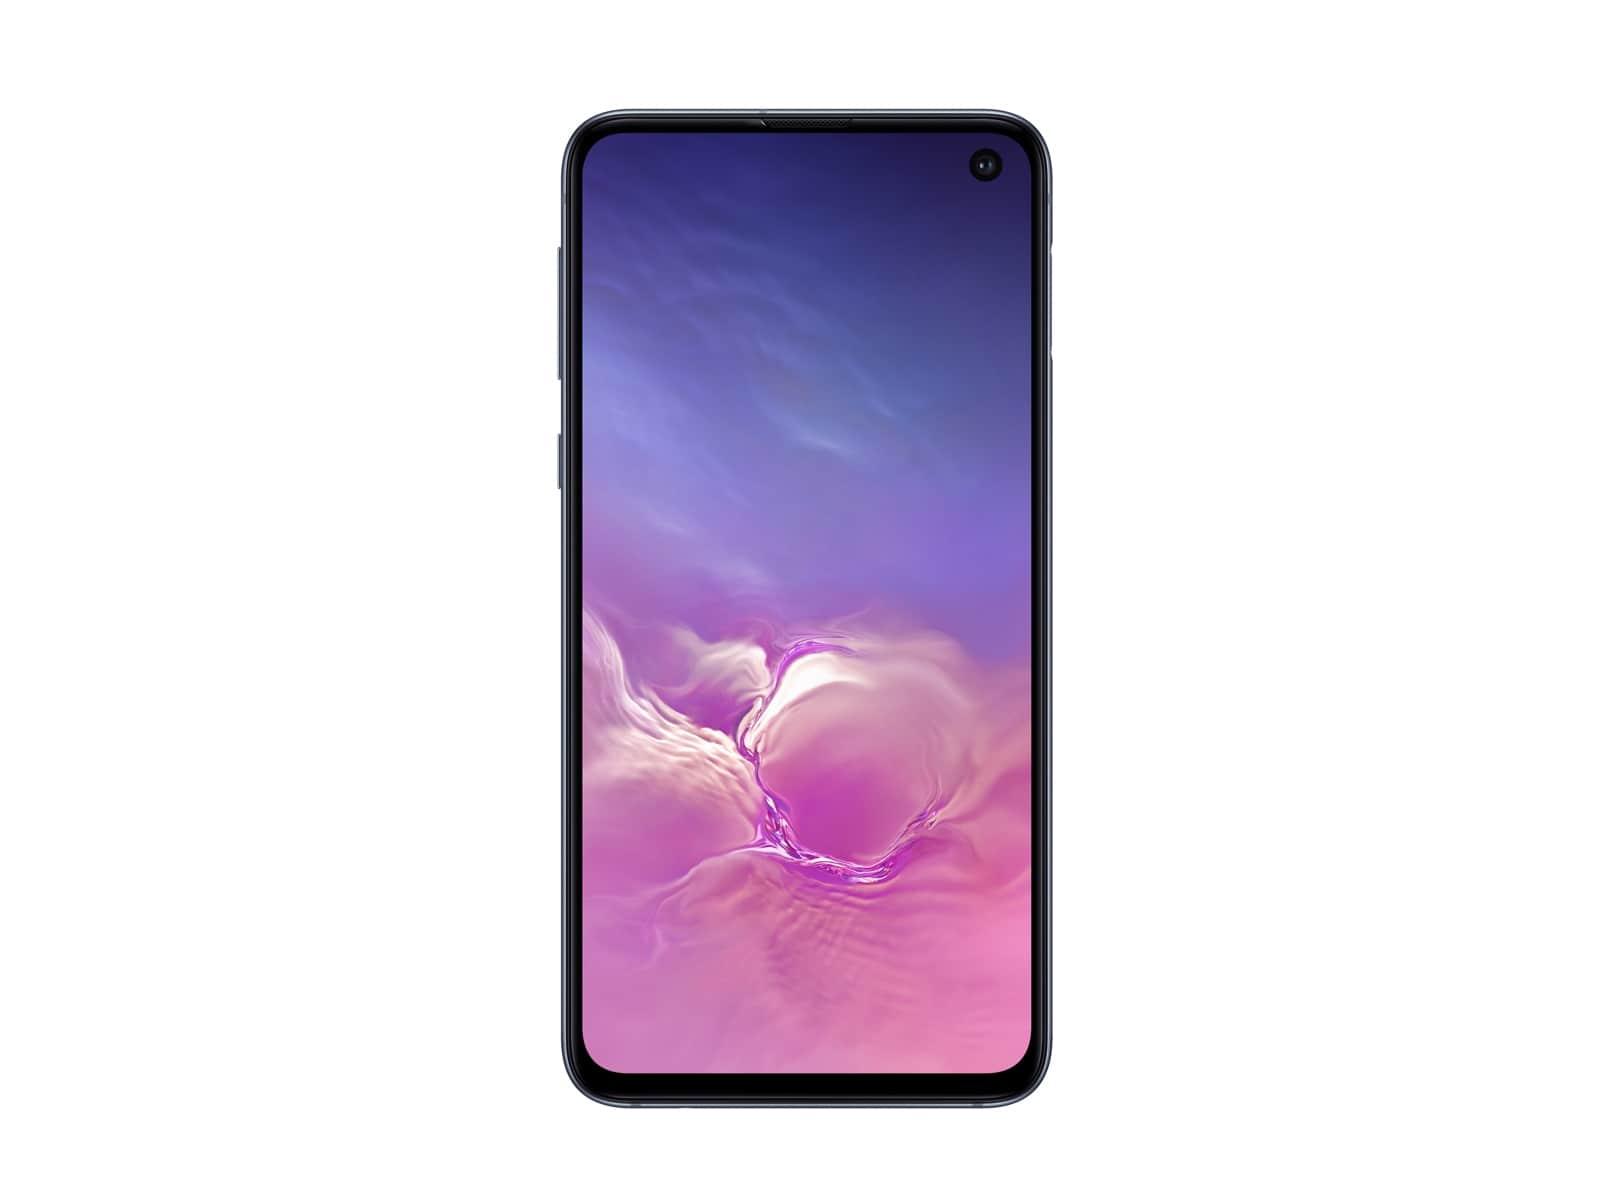 Pre-Order Samsung Galaxy S10 Models with Unidays Discounts $693